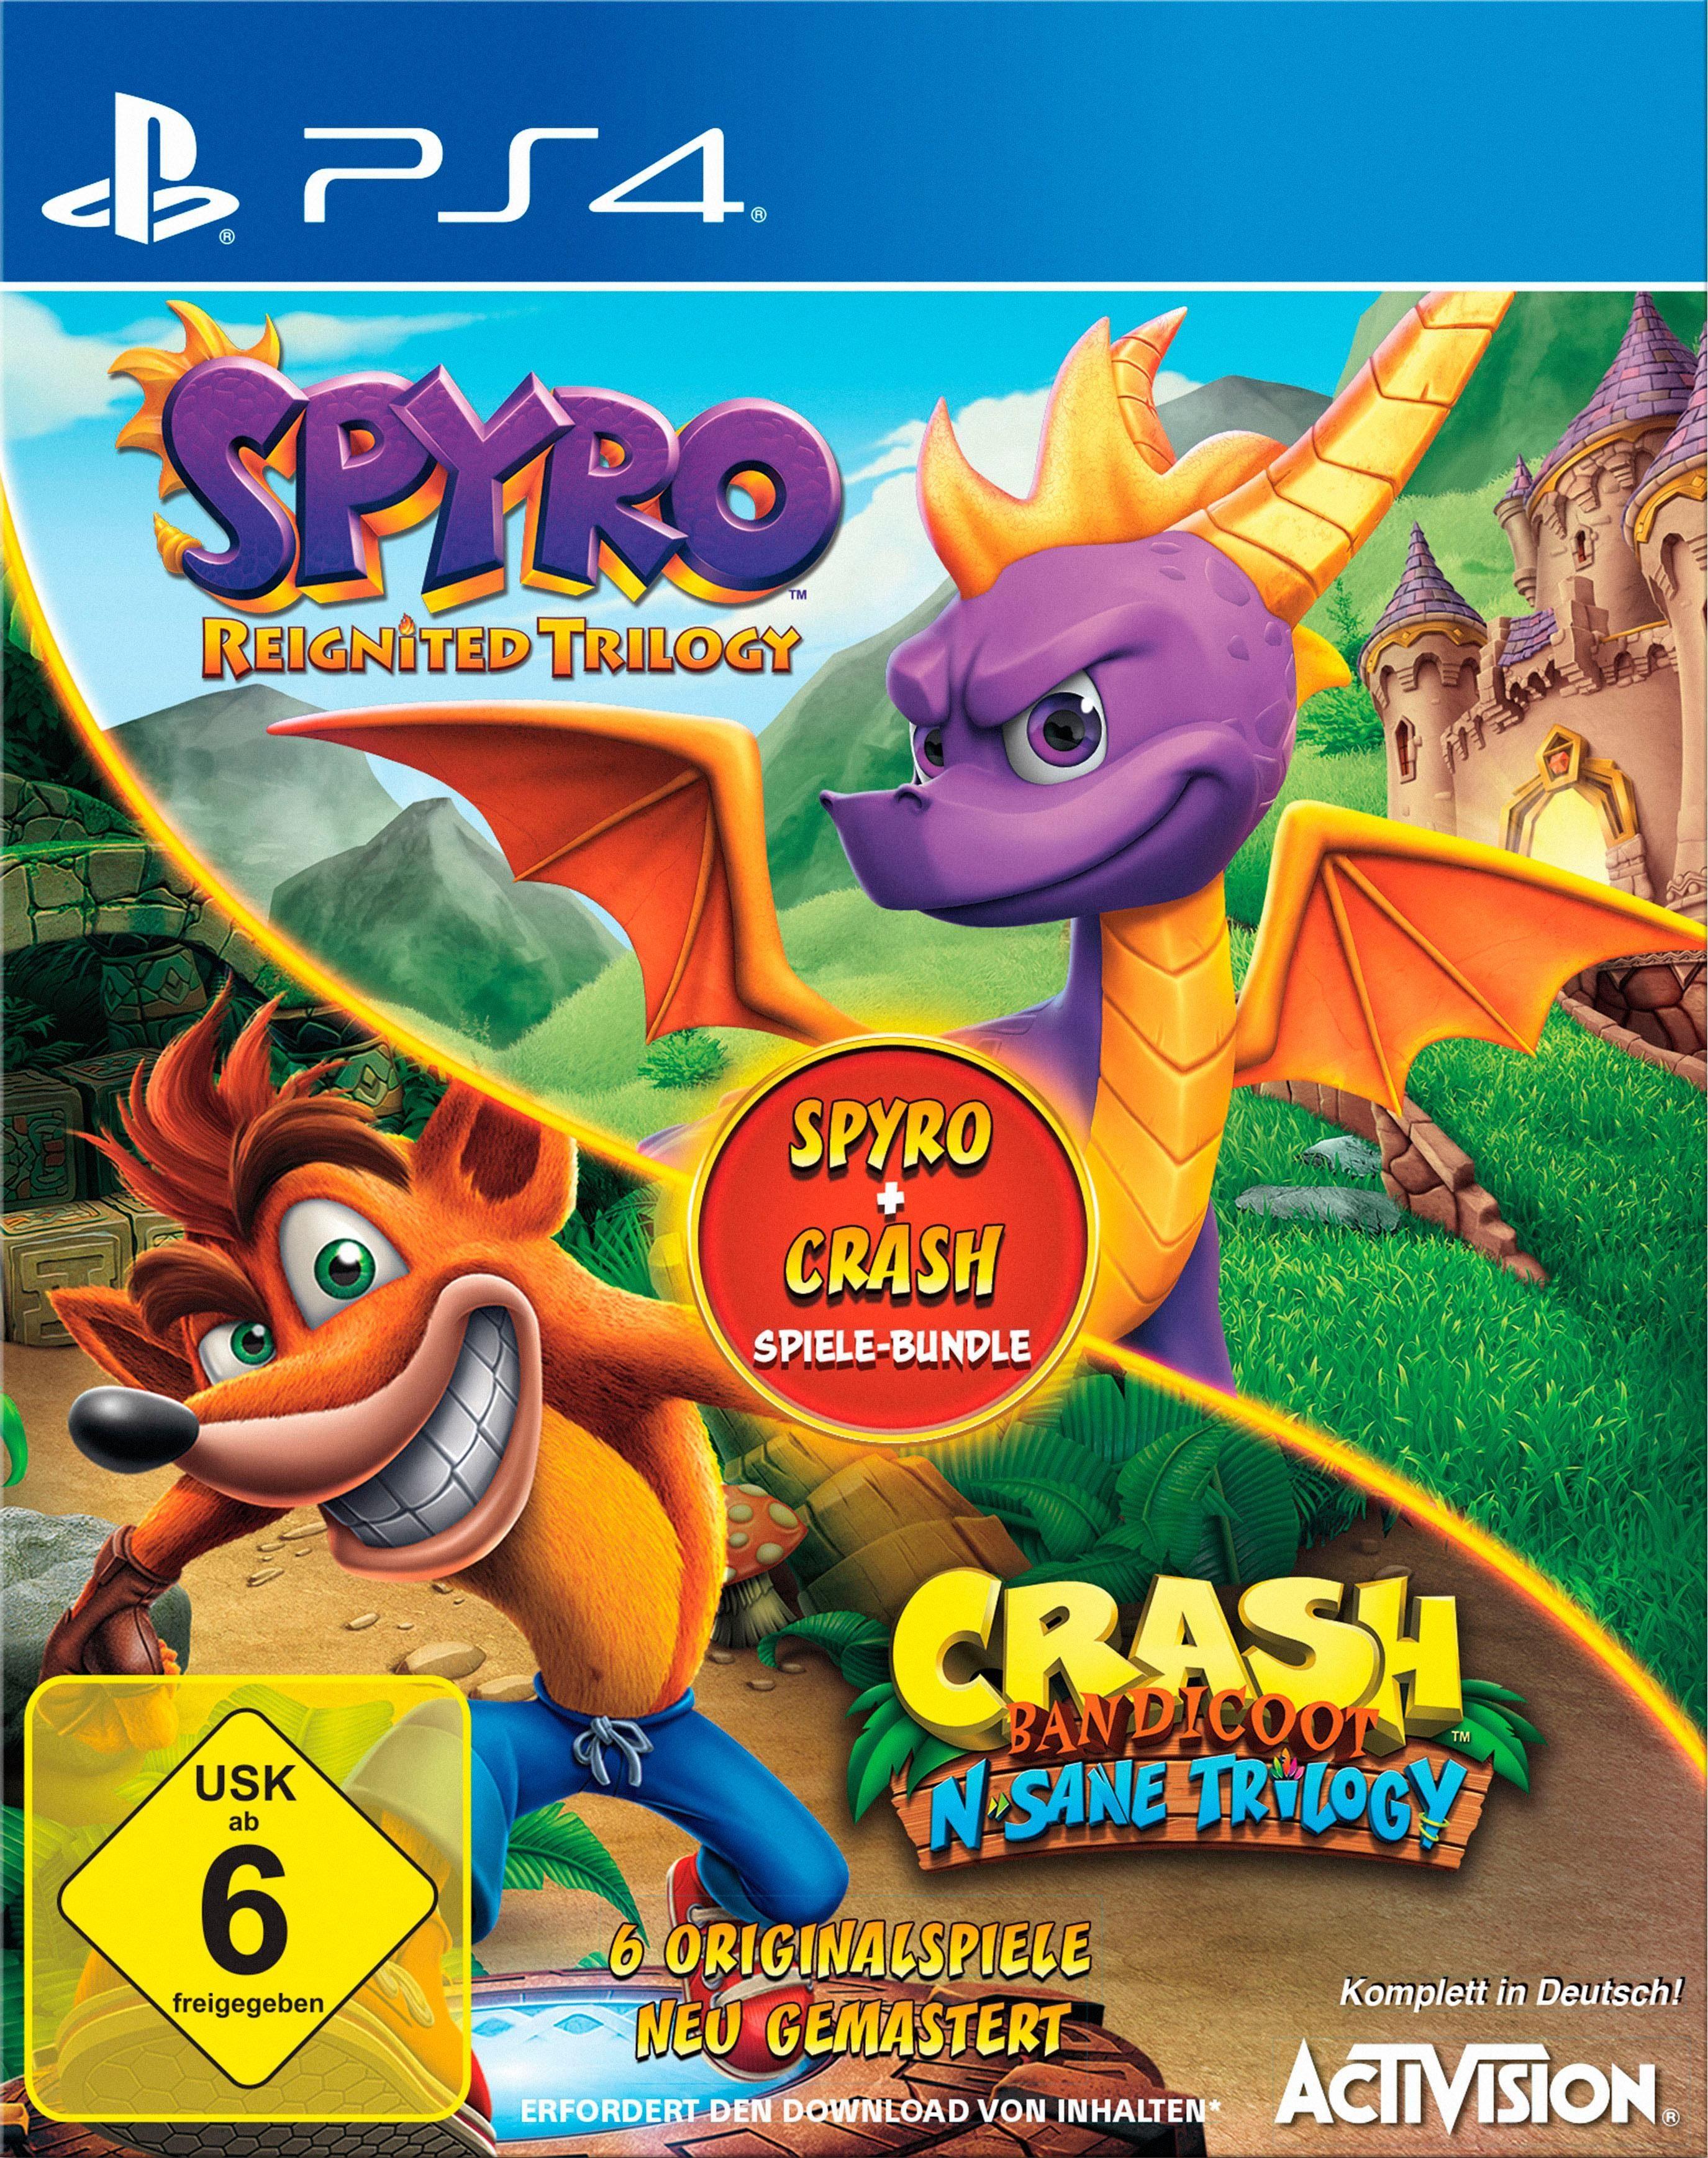 Spyro & Crash PlayStation 4